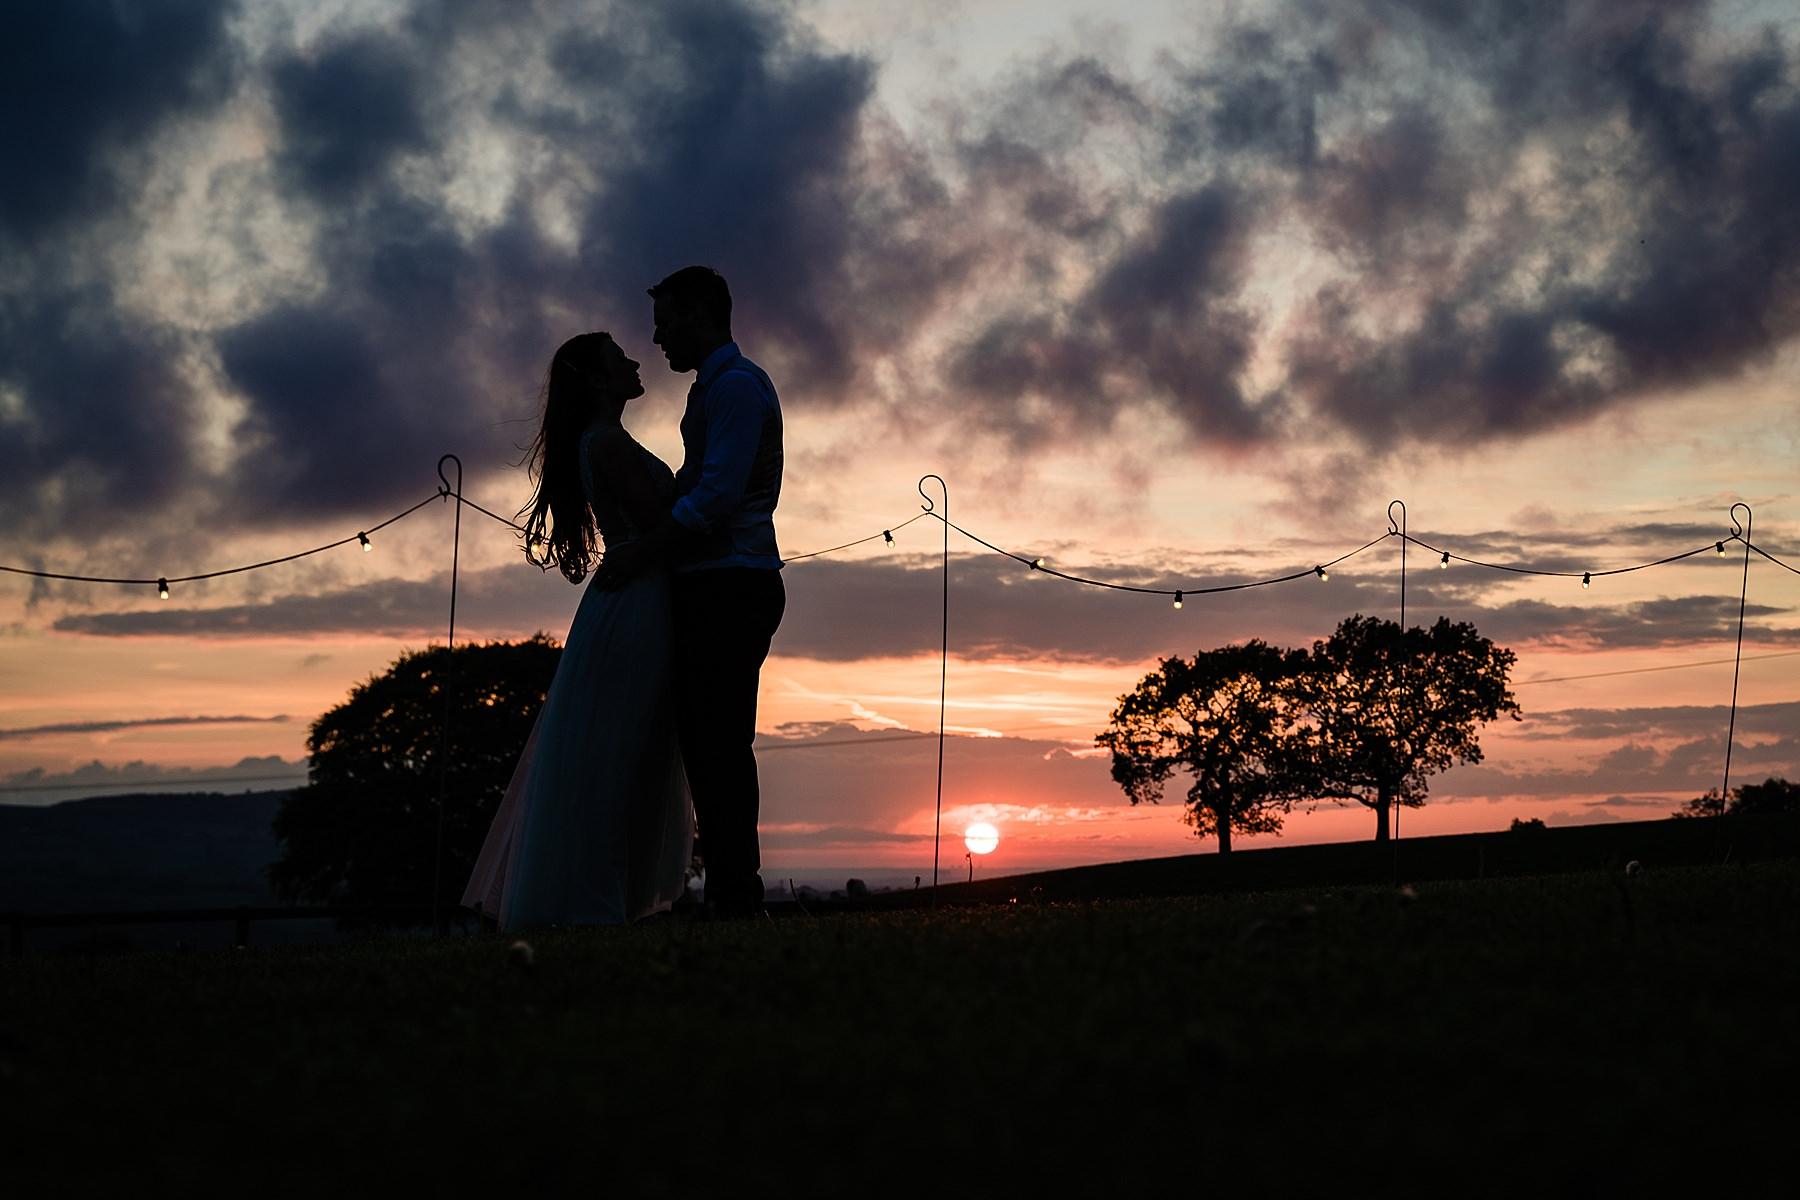 sunset photo at heaton house farm